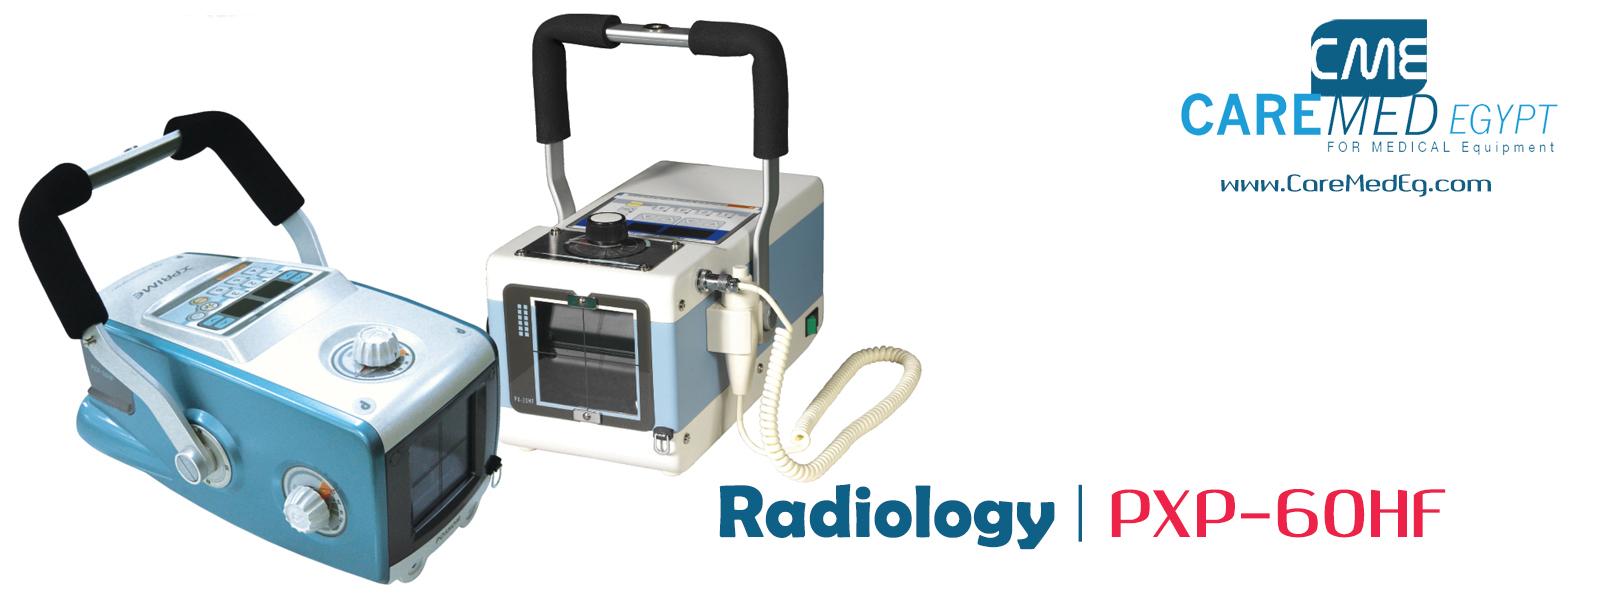 Radiology PXP-60HF